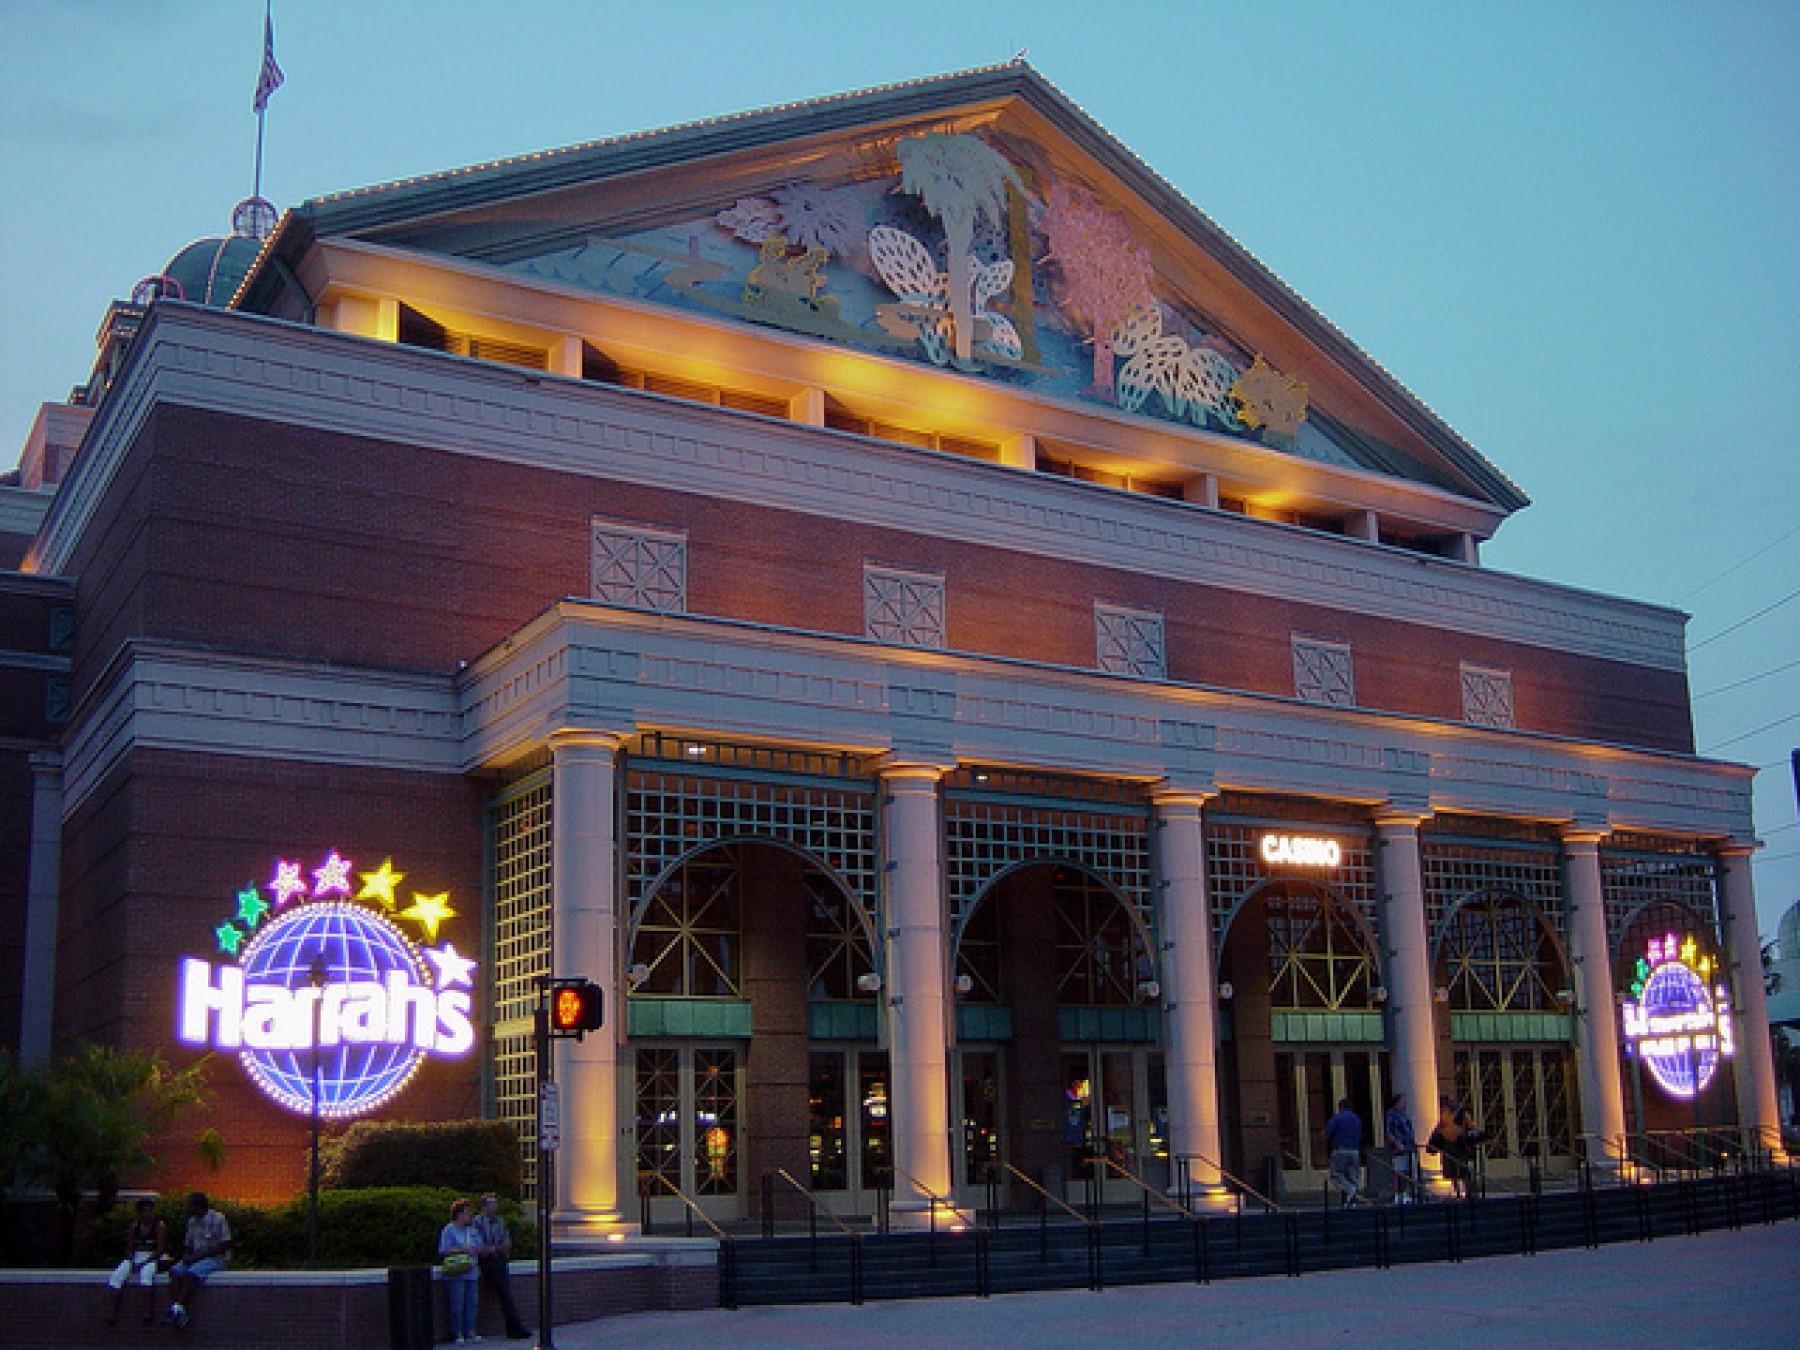 Exterior view of Harrah's Casino near the hotel